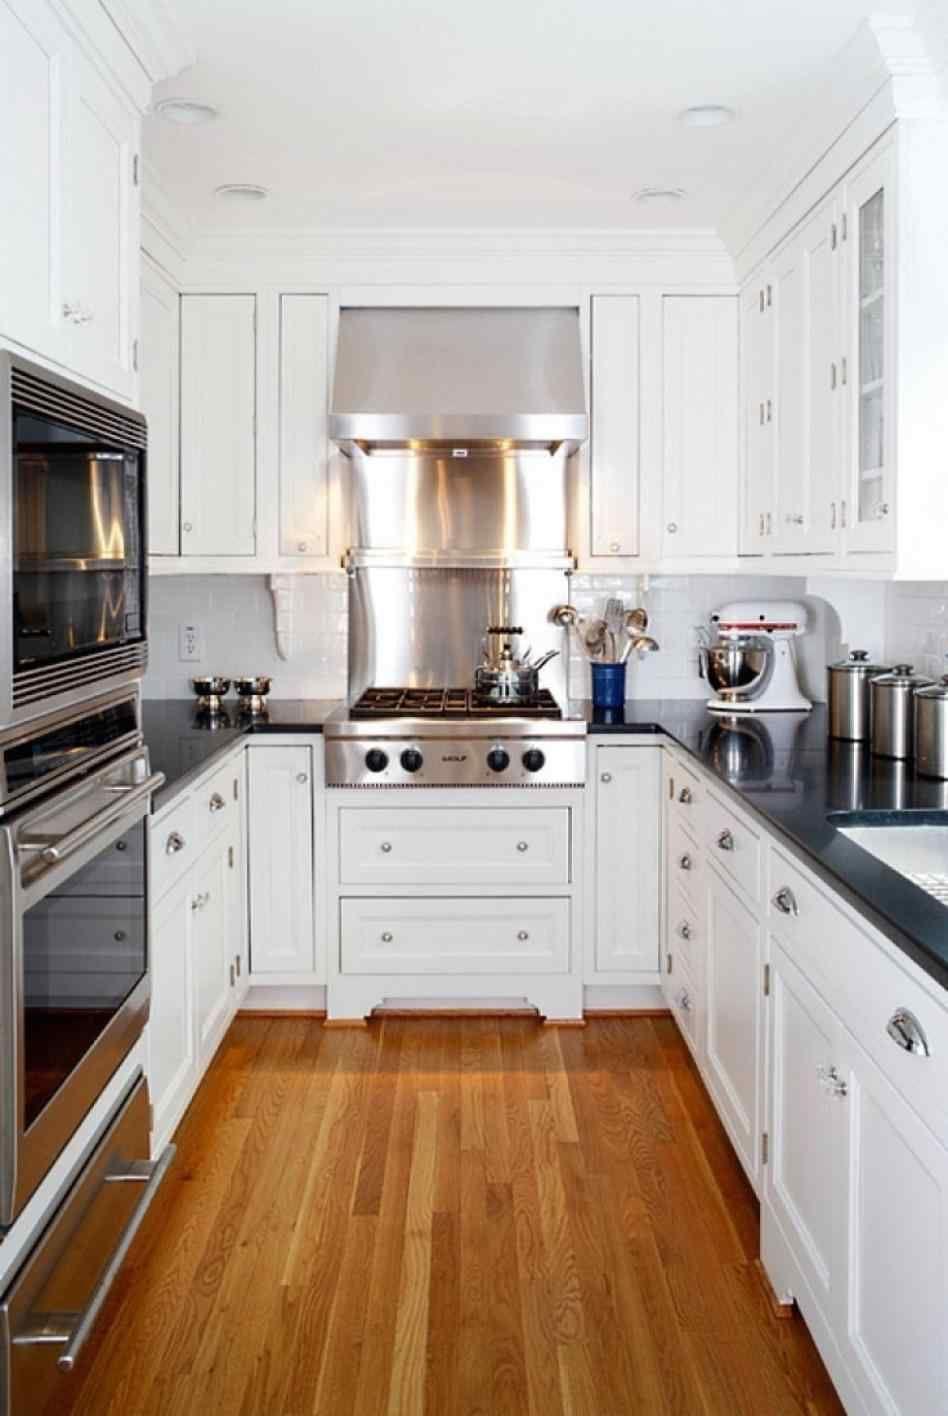 Kitchen Appliancesbronze Appliance Brands Best Kitchen Small Fair Best Kitchen Appliances Design Ideas